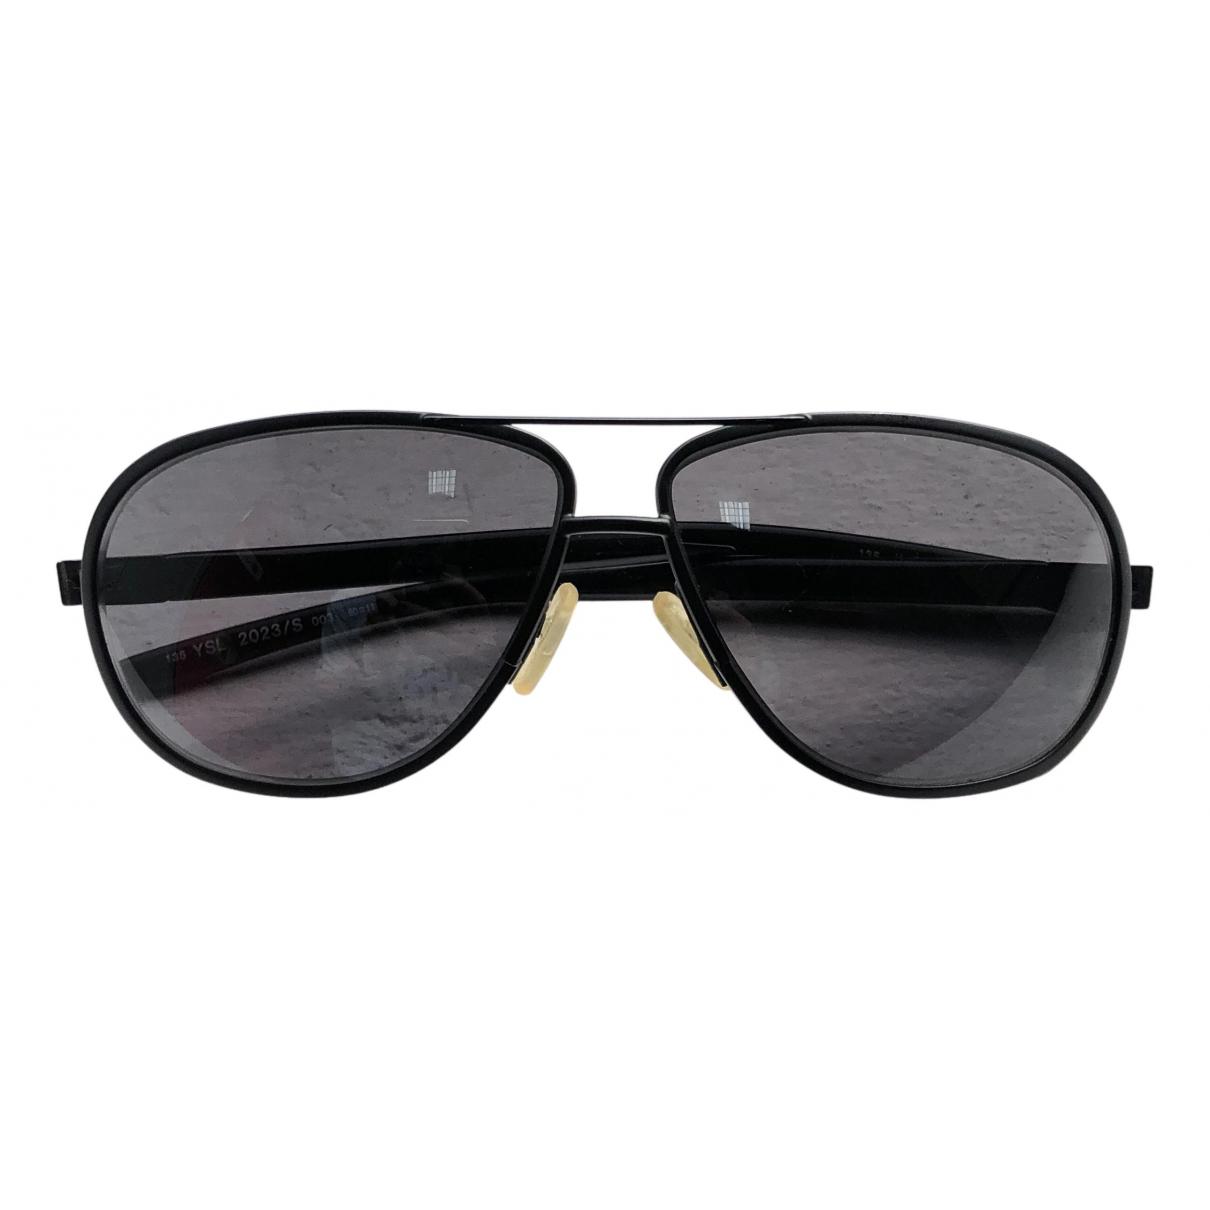 Yves Saint Laurent N Black Metal Sunglasses for Women N